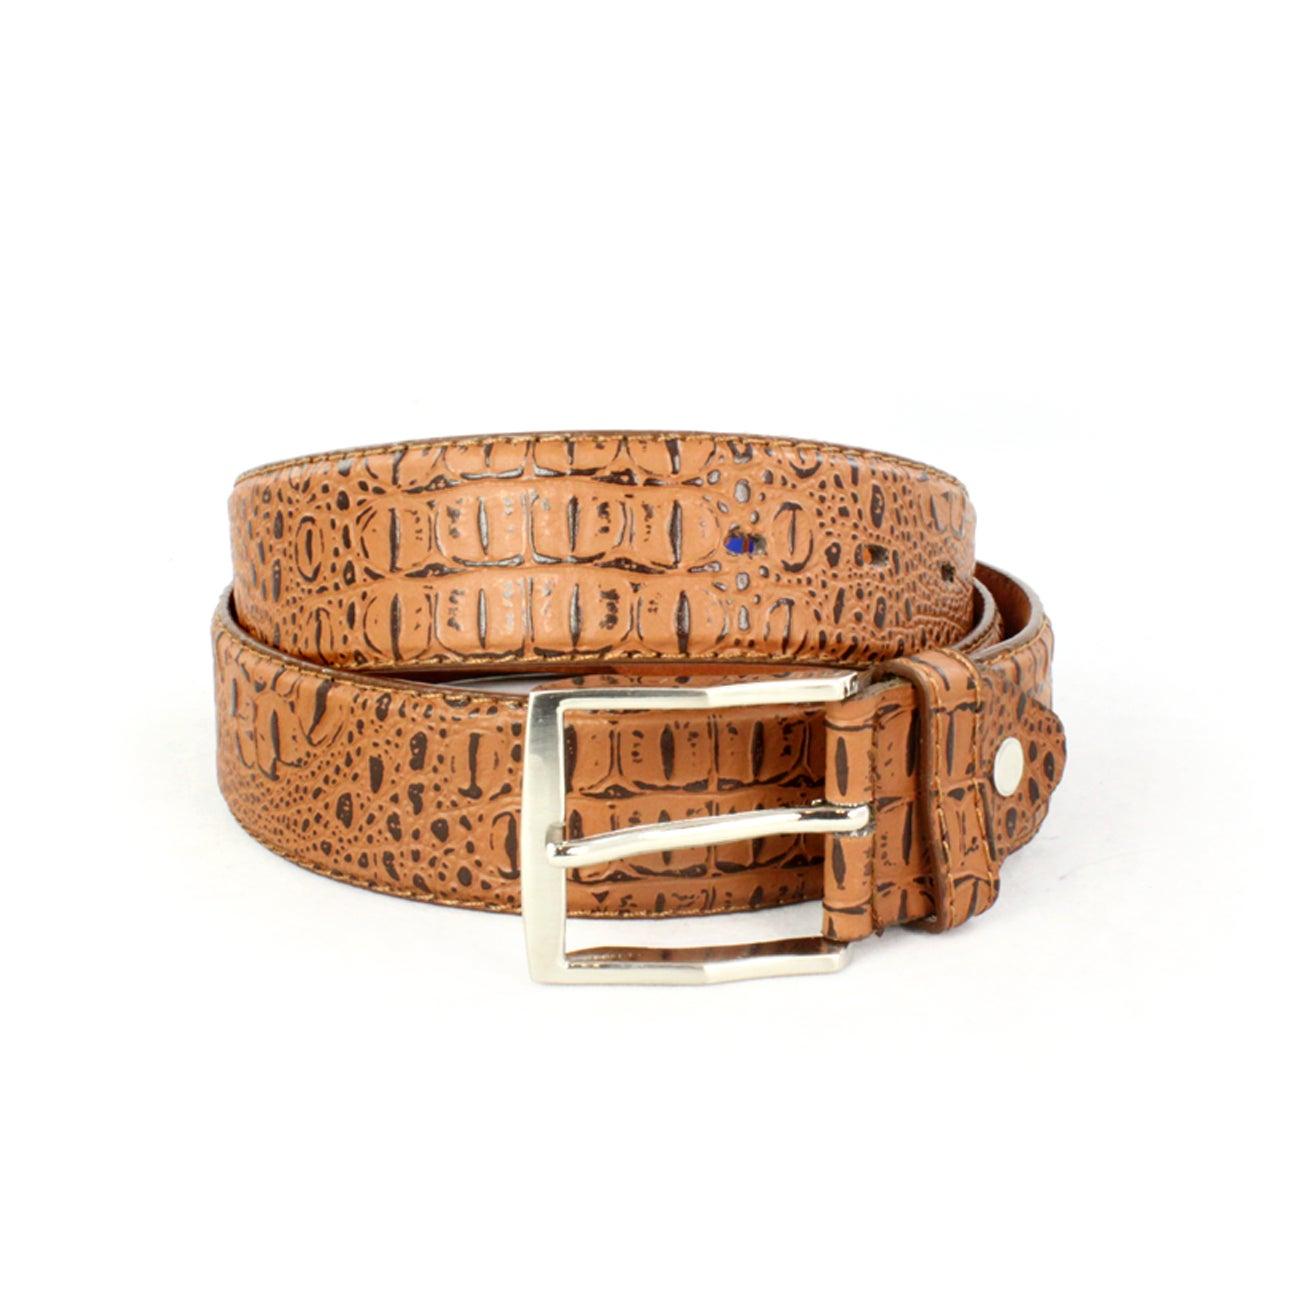 Faddism Men's Crocodile Embossed Tan Belt (Medium)